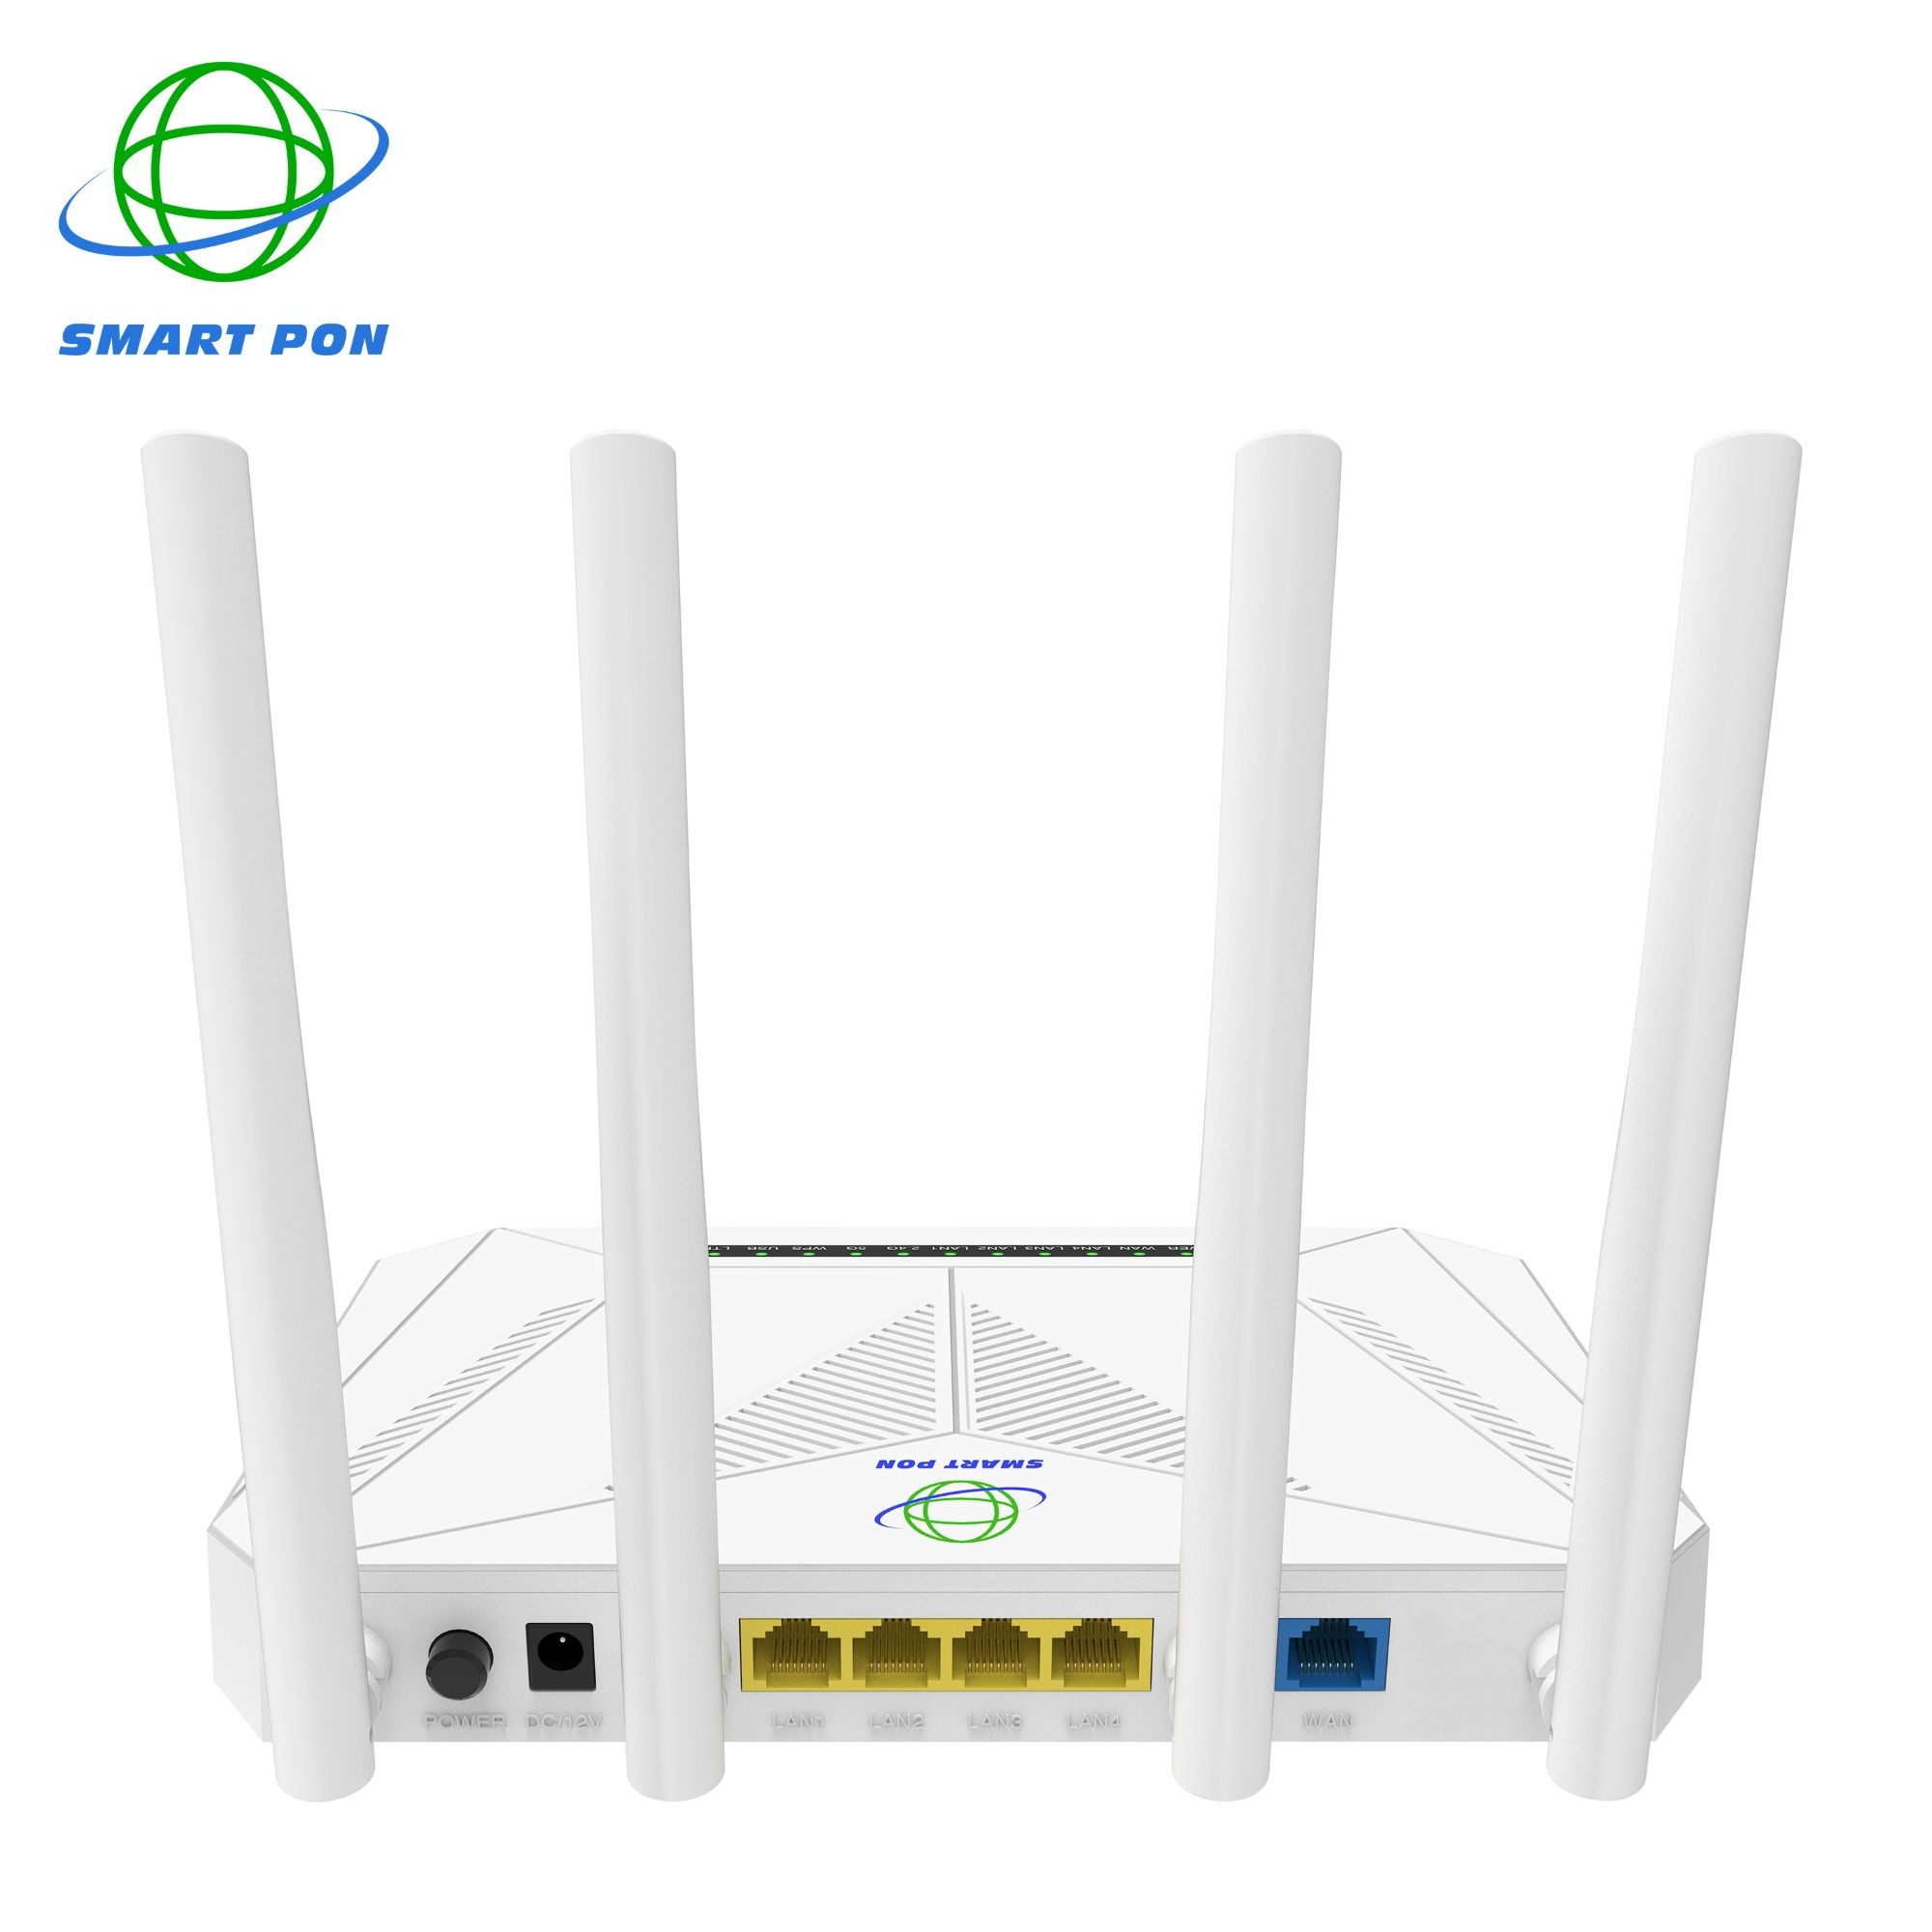 راوتر CAT 6 LTE Wi-Fi AC 1200 CPE